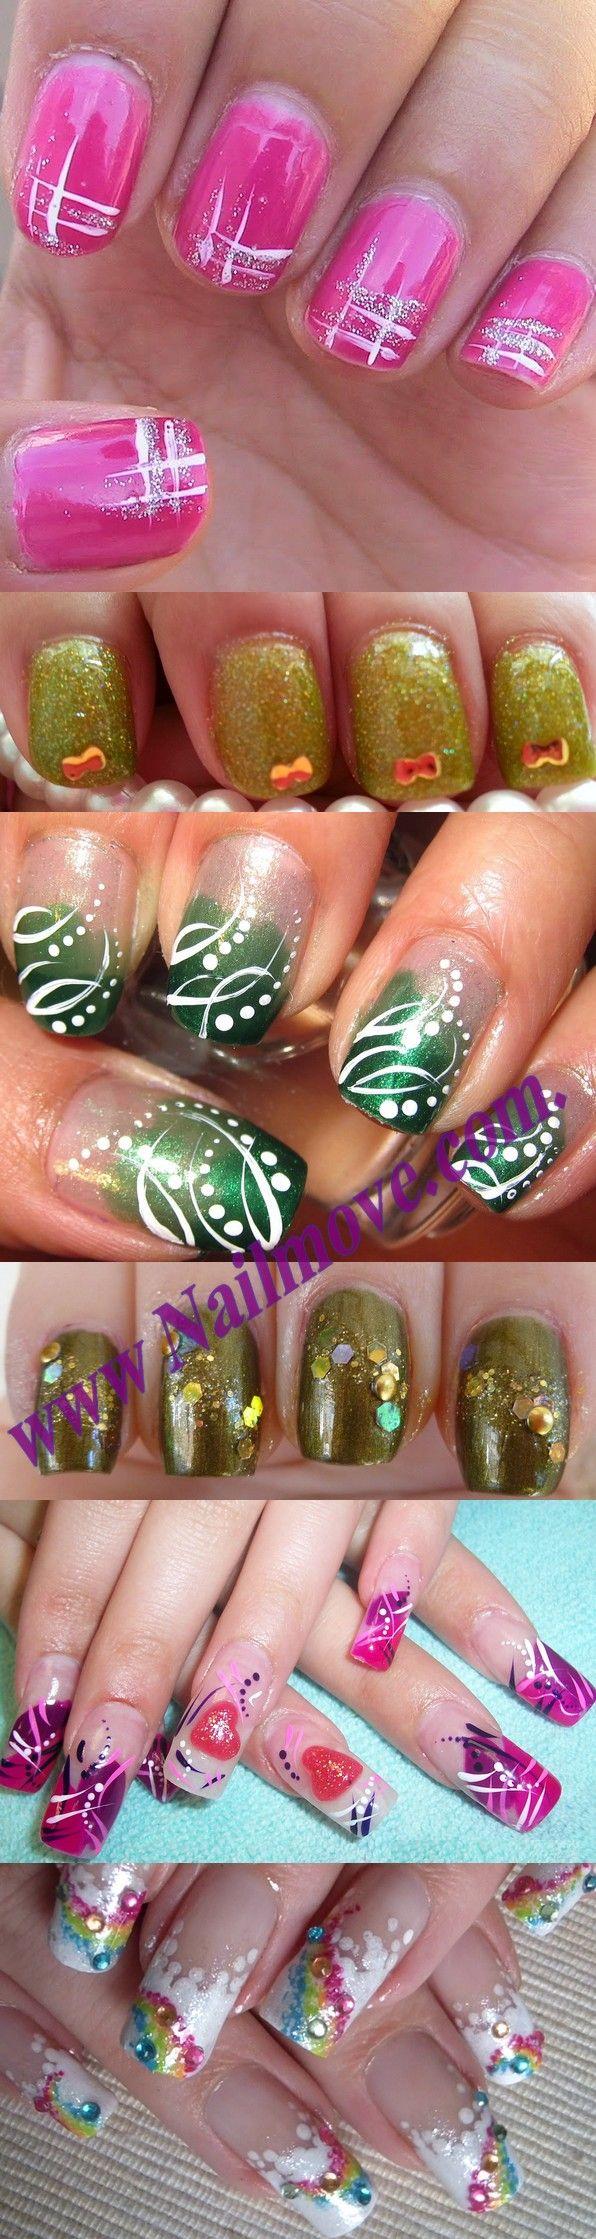 Pink nail designs pinterest, simple pink nail designs, pink acrylic nail designs, pink nail art pinterest, Pink nail designs tumblr, pink nail art designs gallery,